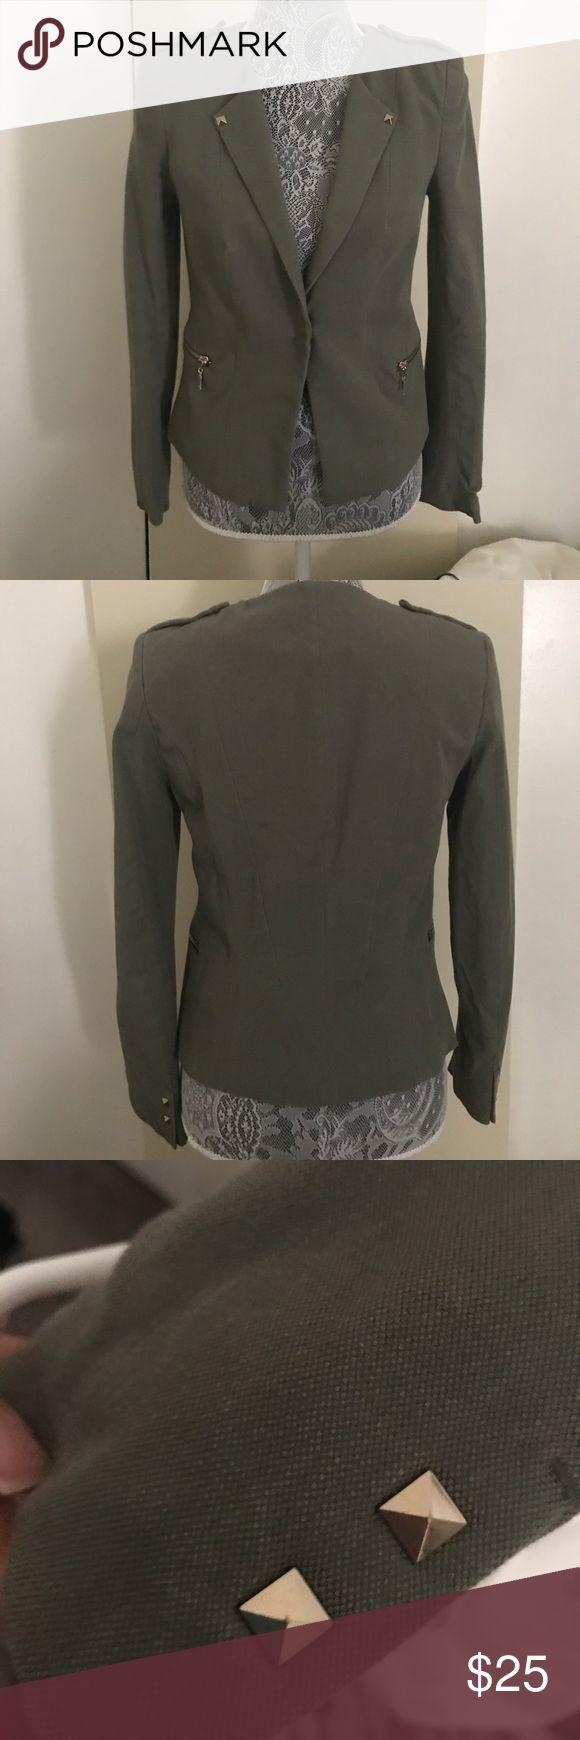 Olive green blazer Super cute olive green blazer H&M Jackets & Coats Blazers